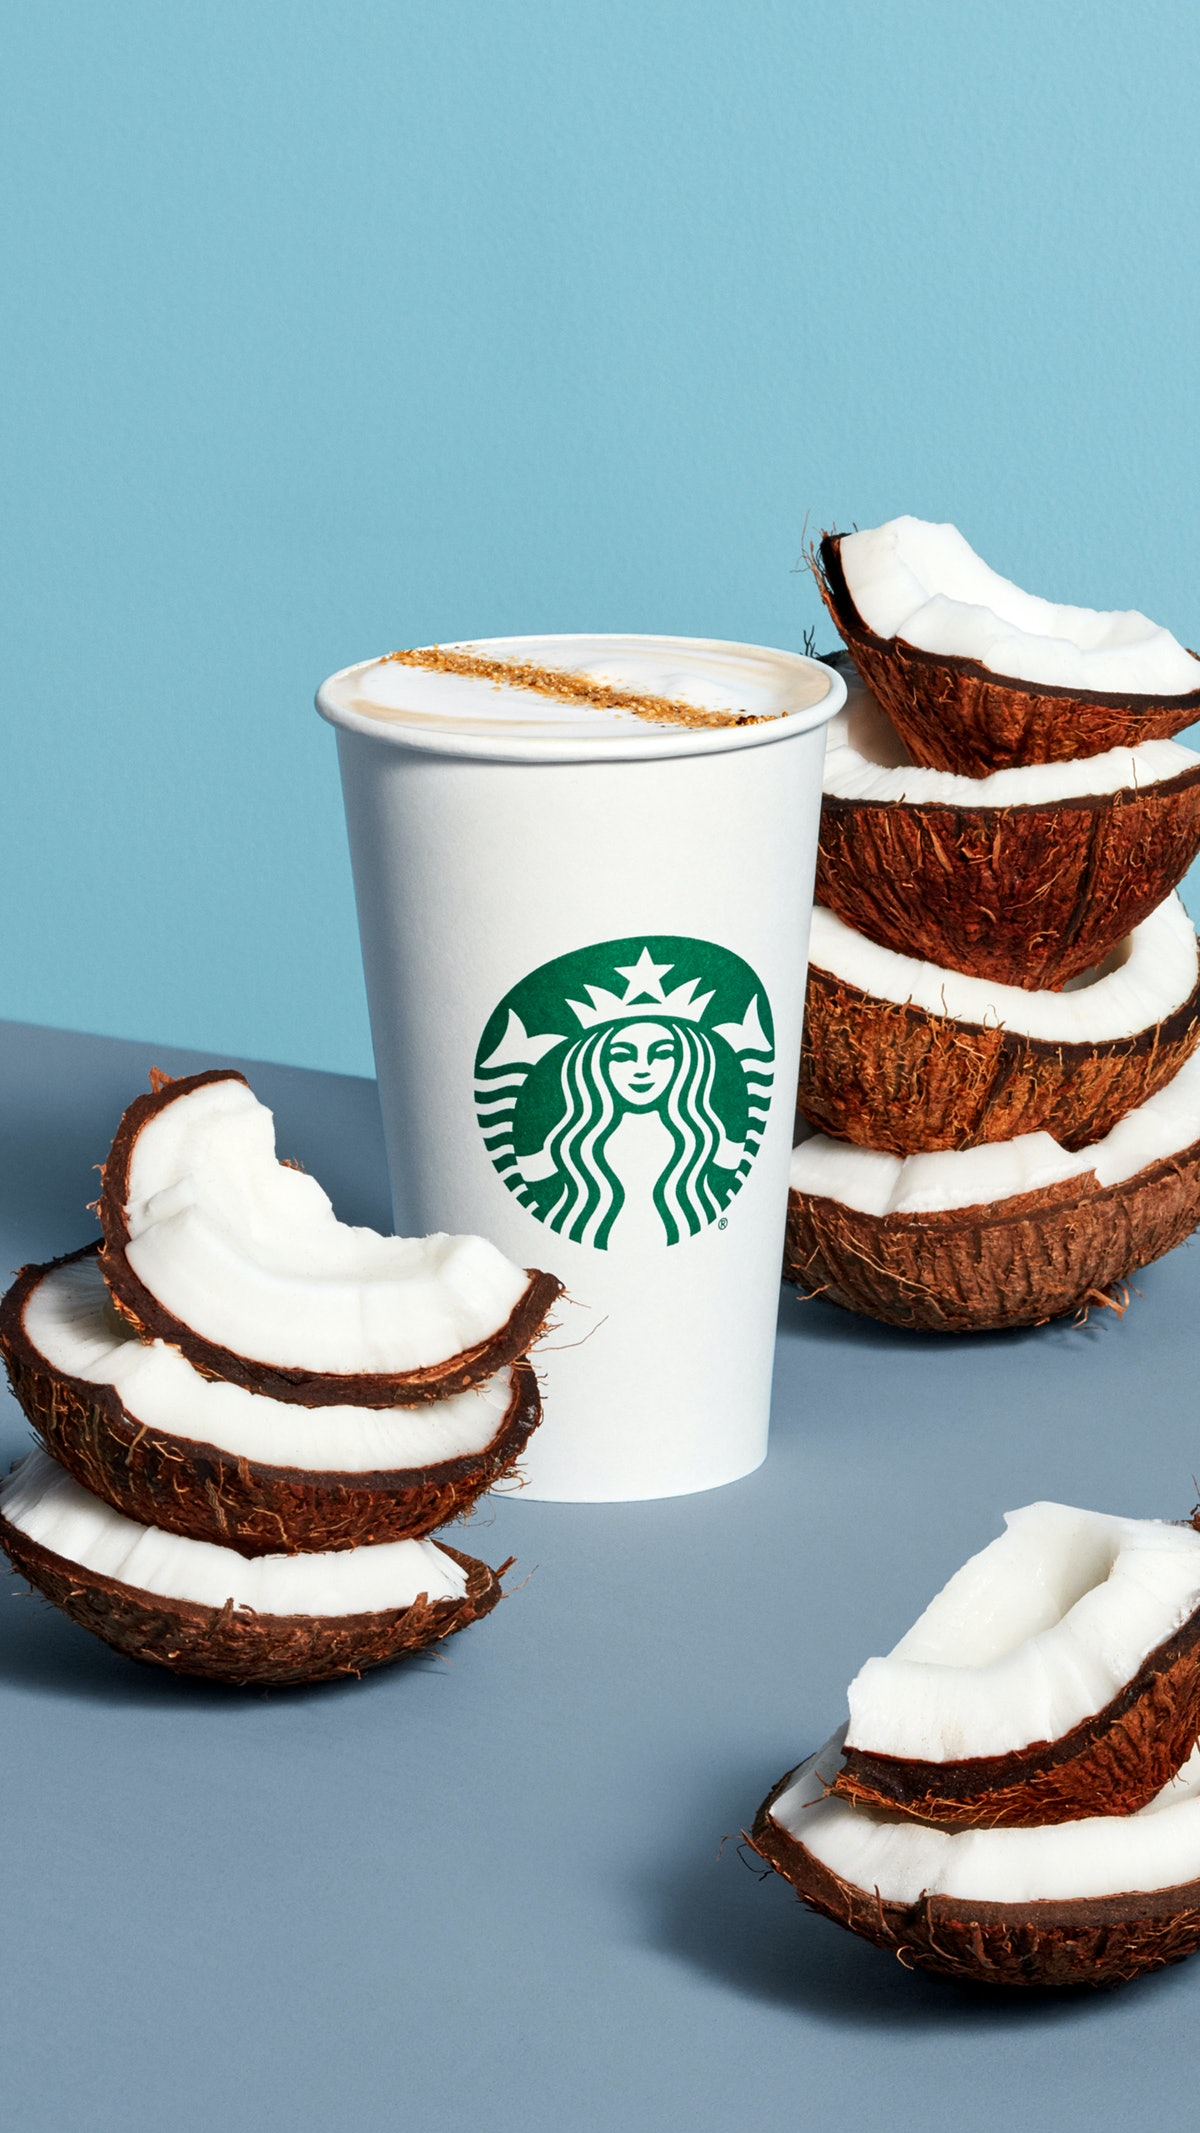 The caffeine in Starbucks' new Coconutmilk Latte will energize you